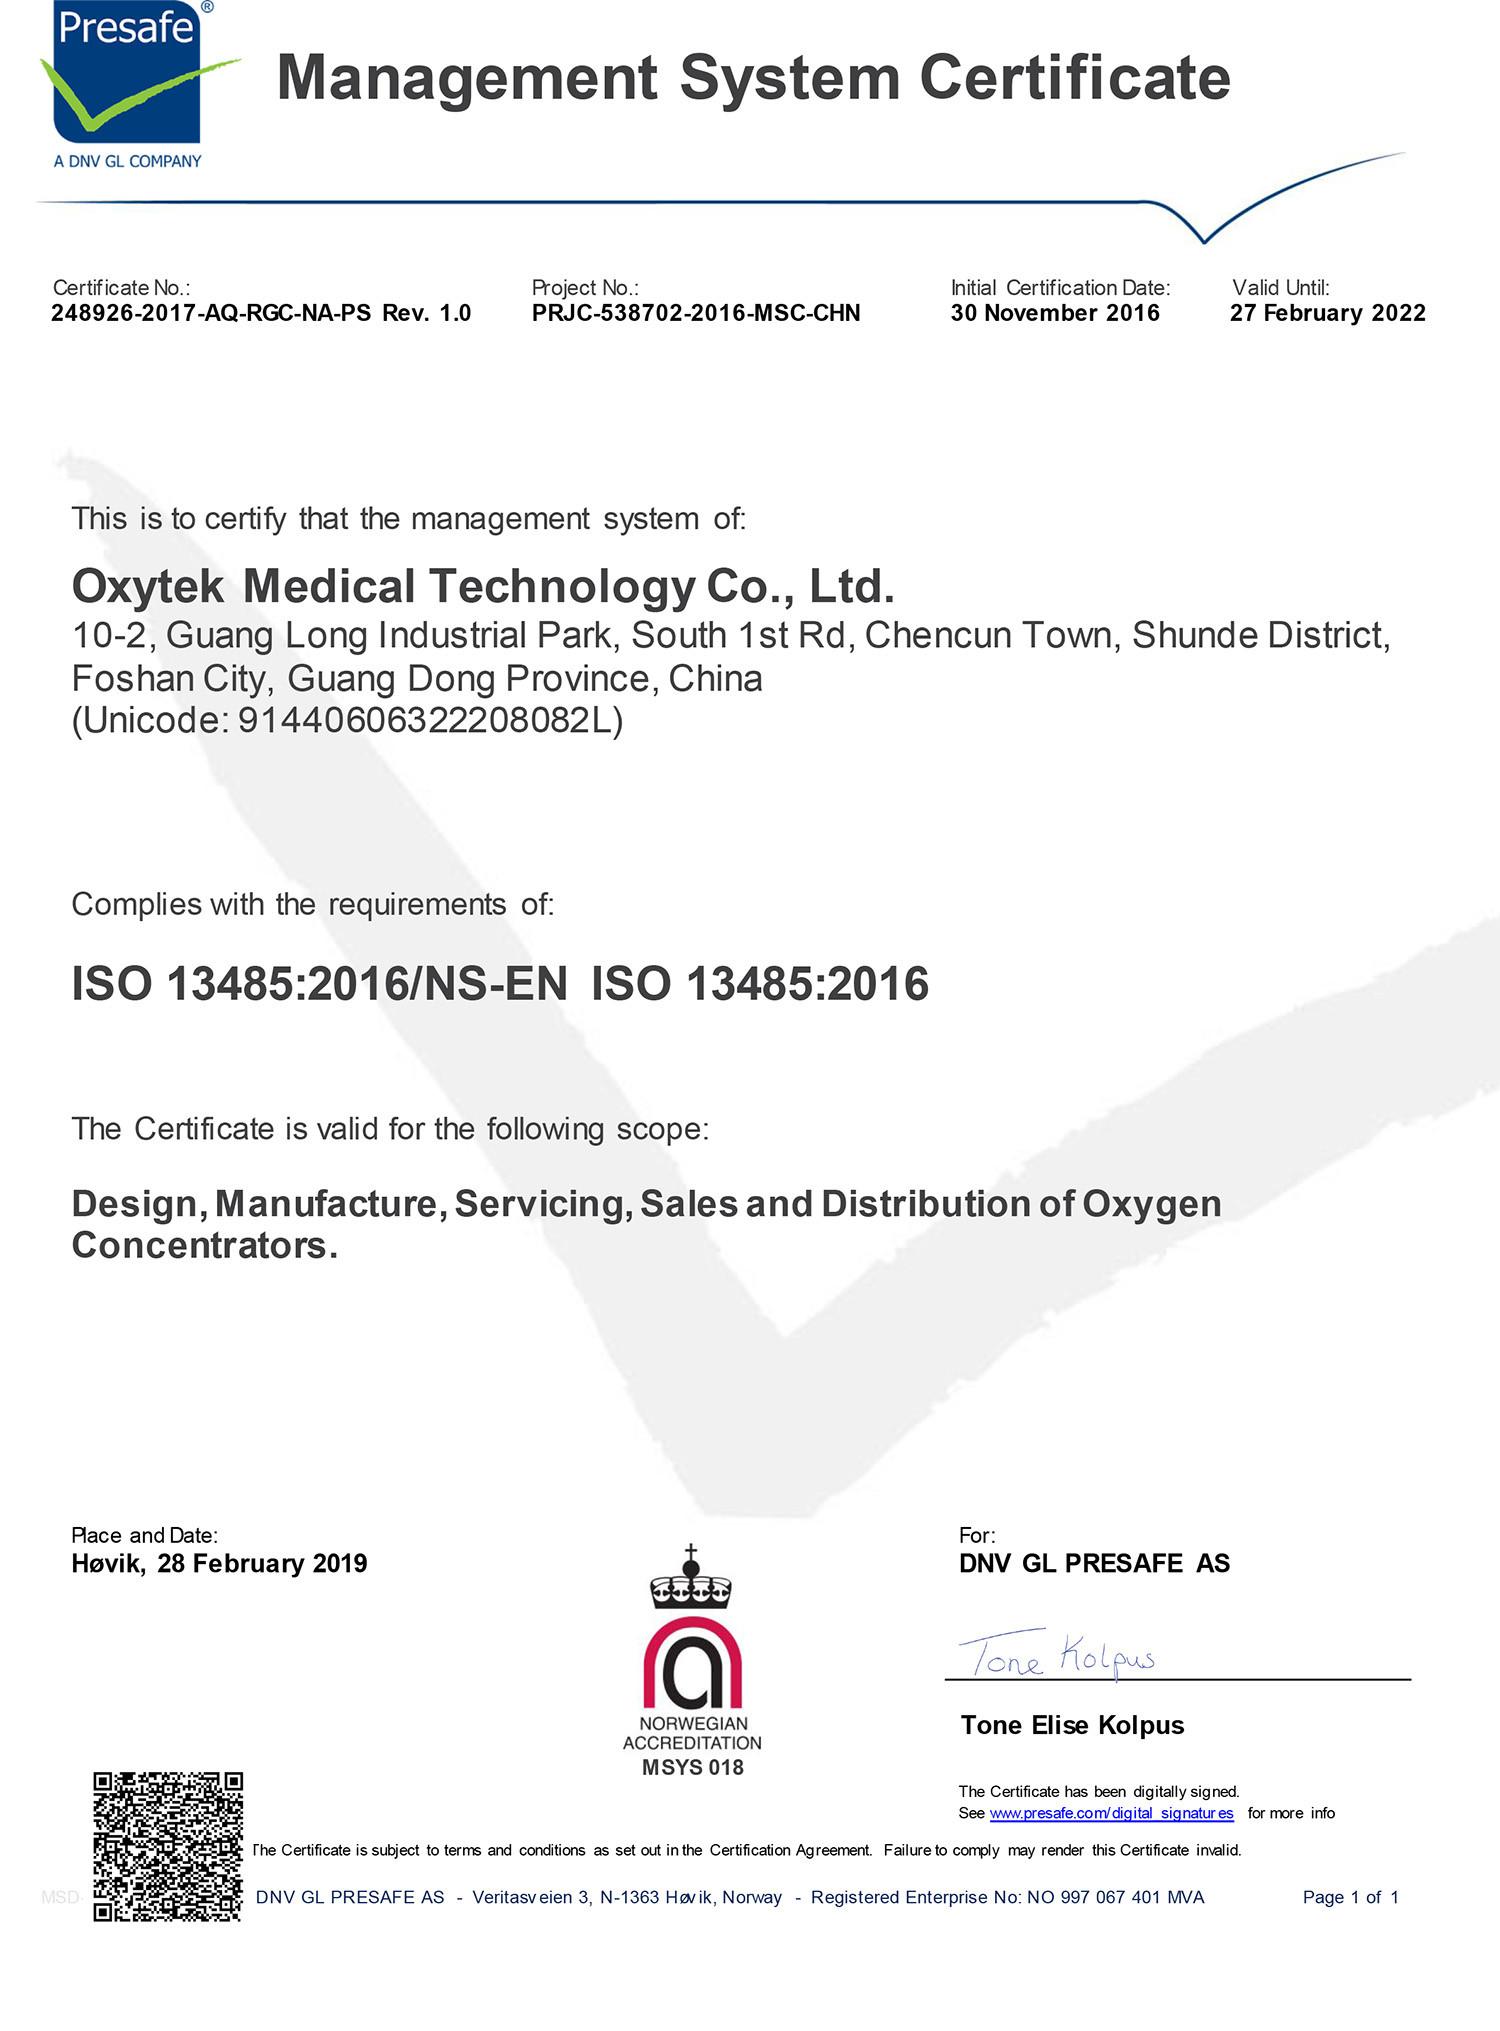 ISO13485-20190227-20220227-英文版(2).jpg